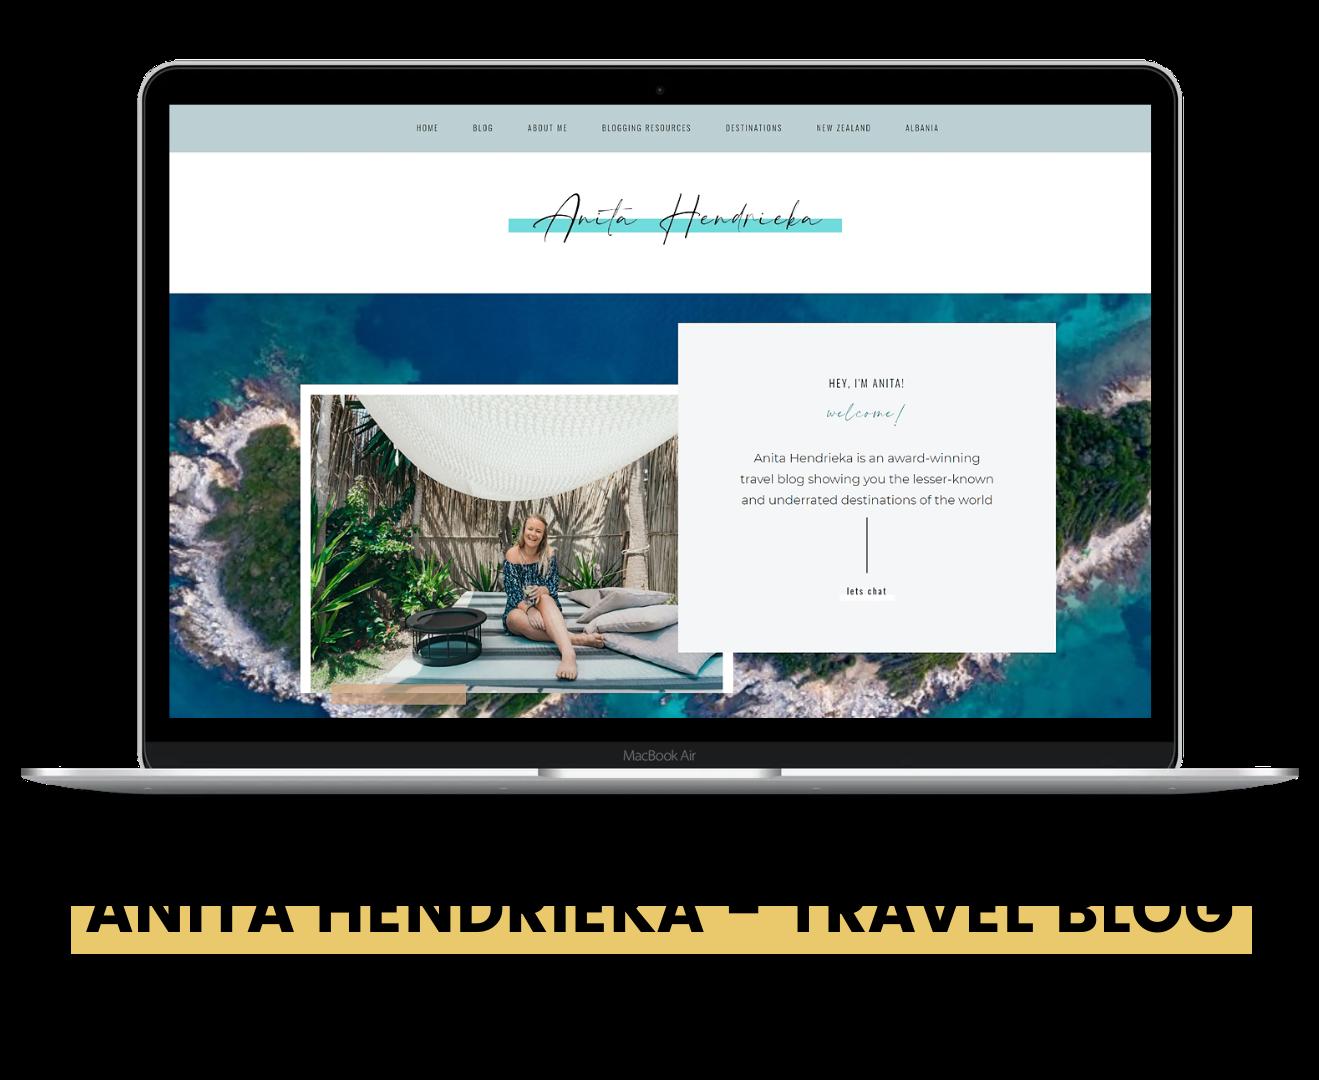 Anita Hendrieka travel blogger